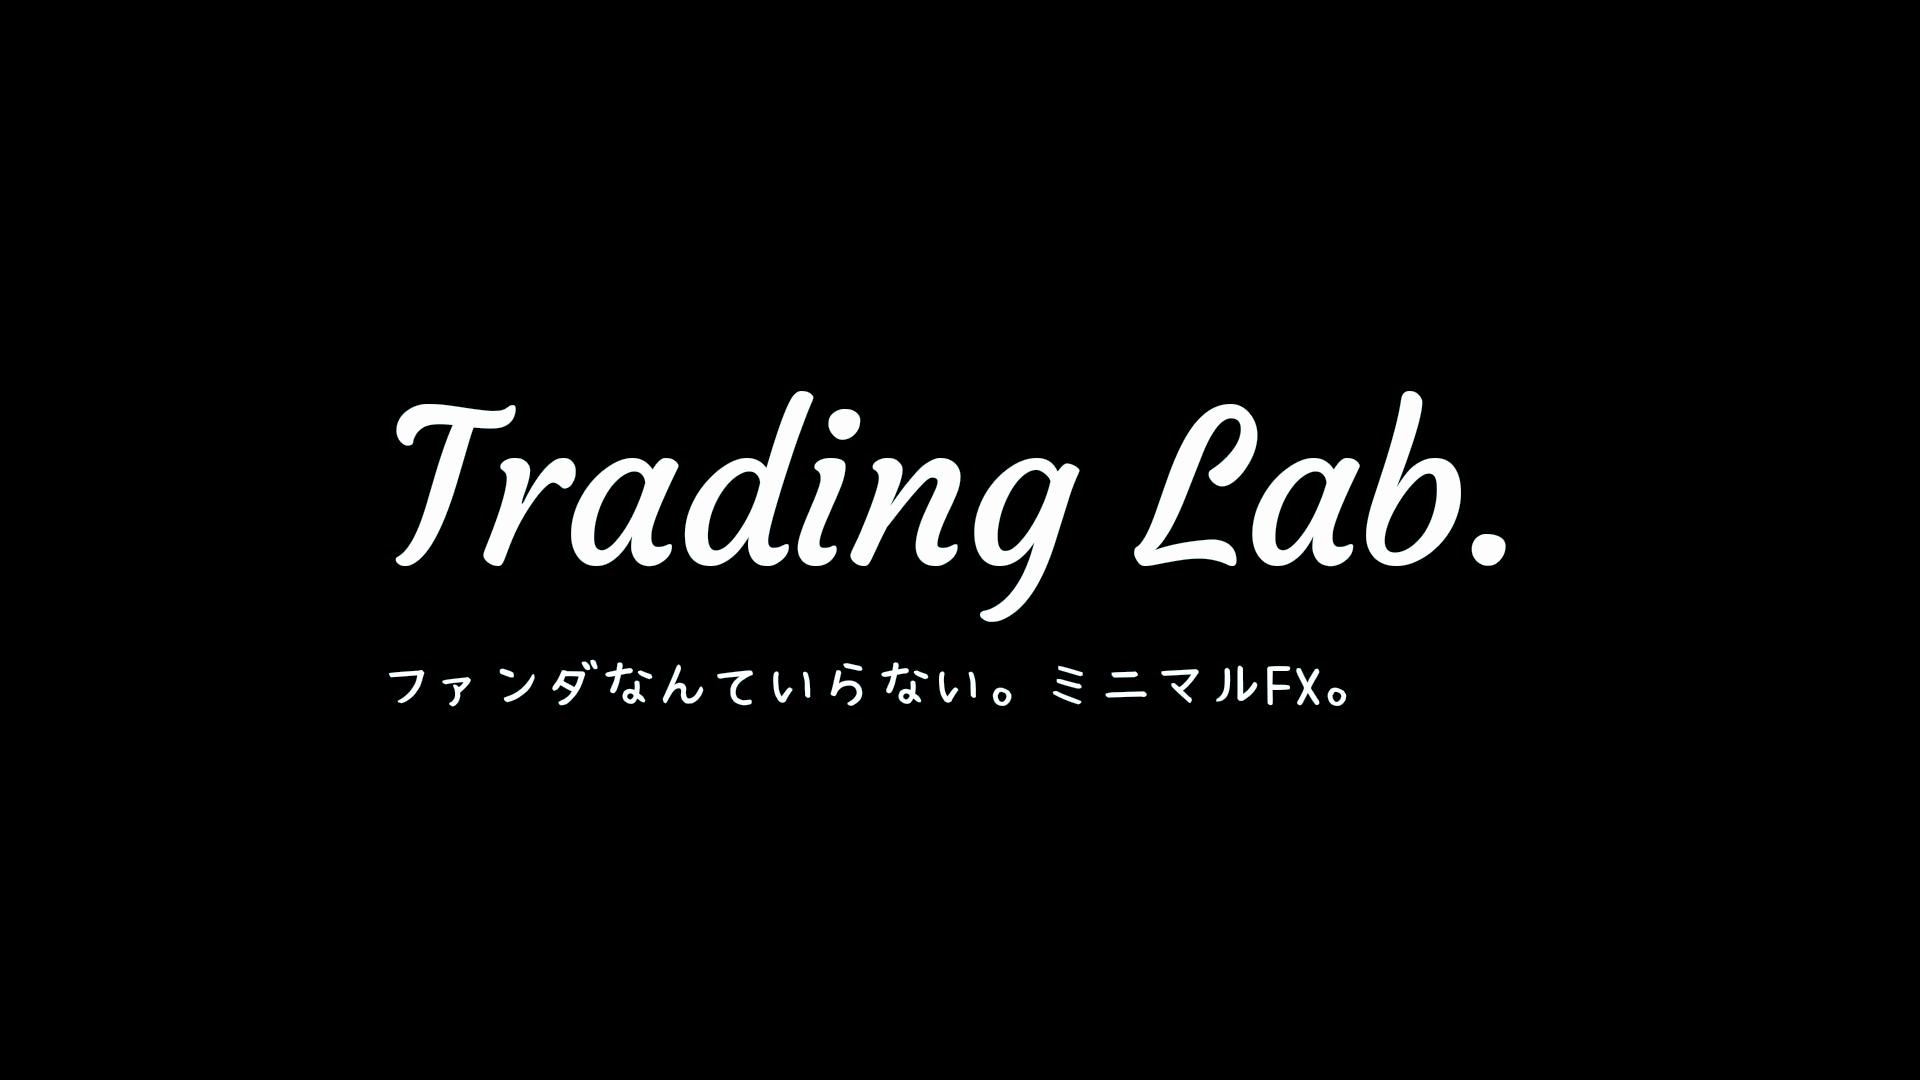 Trading Lab.